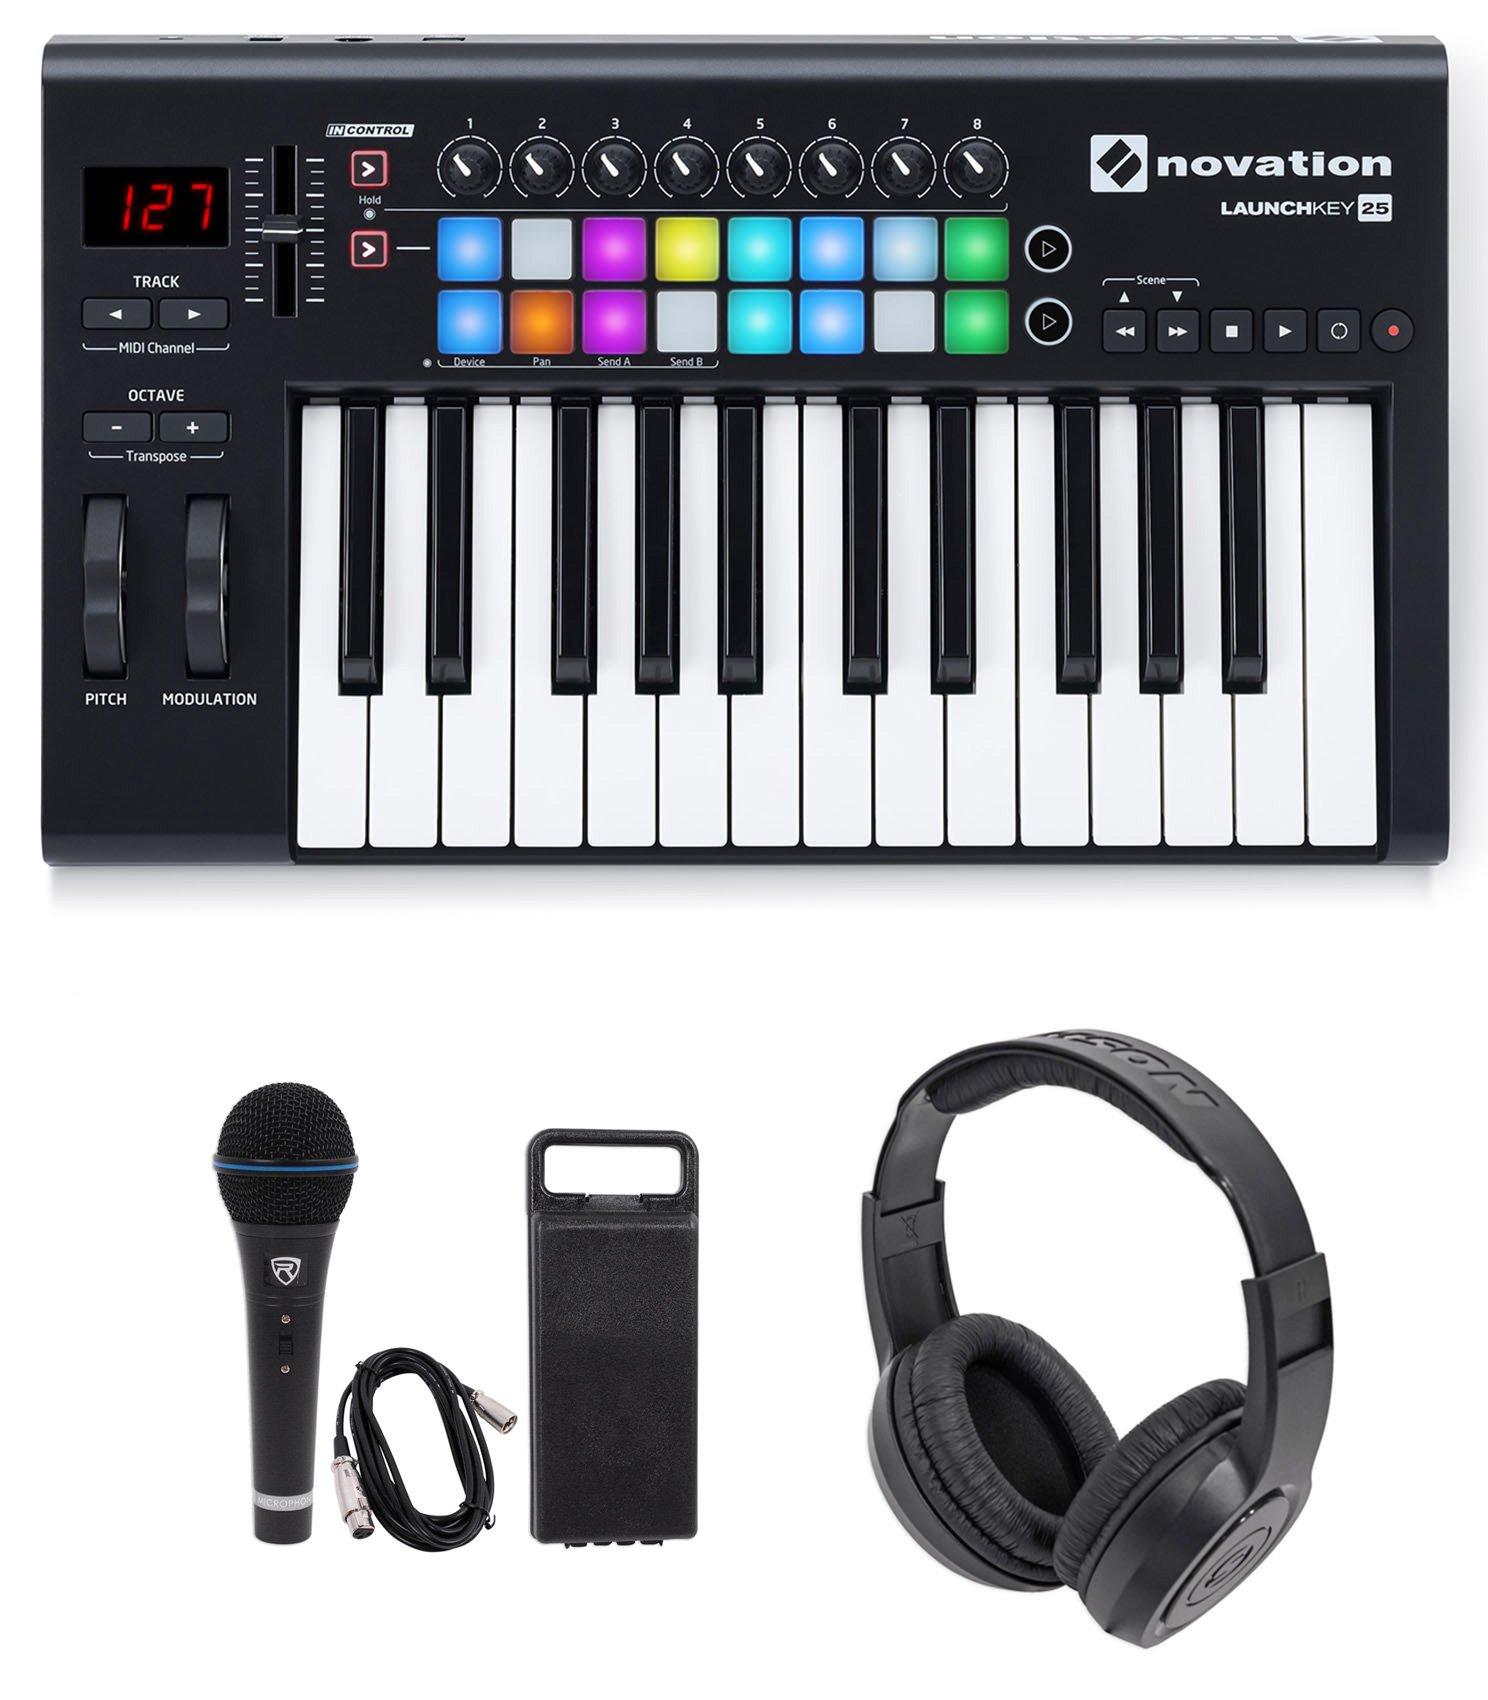 Novation LAUNCHKEY-25-MK2 USB MIDI Keyboard Controller + Mic + Headphones by Novation